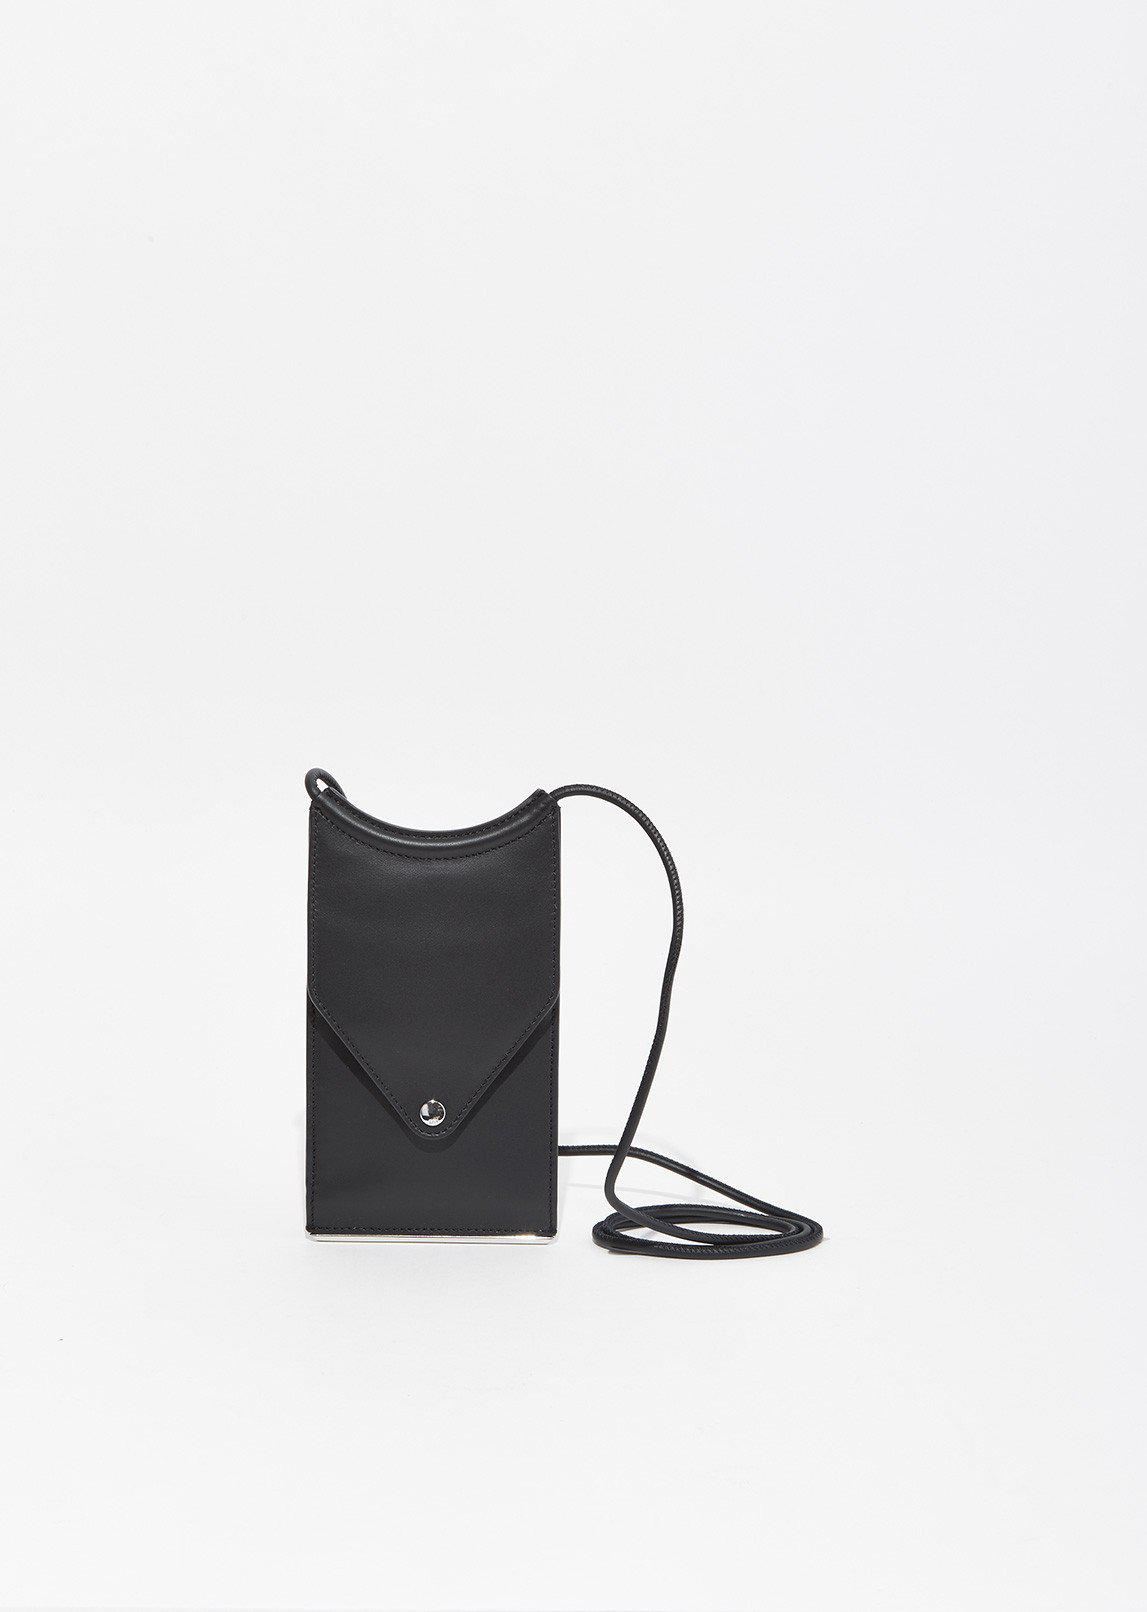 b537a93f4 Alexander Wang Dime Neck Wallet in Black - Lyst